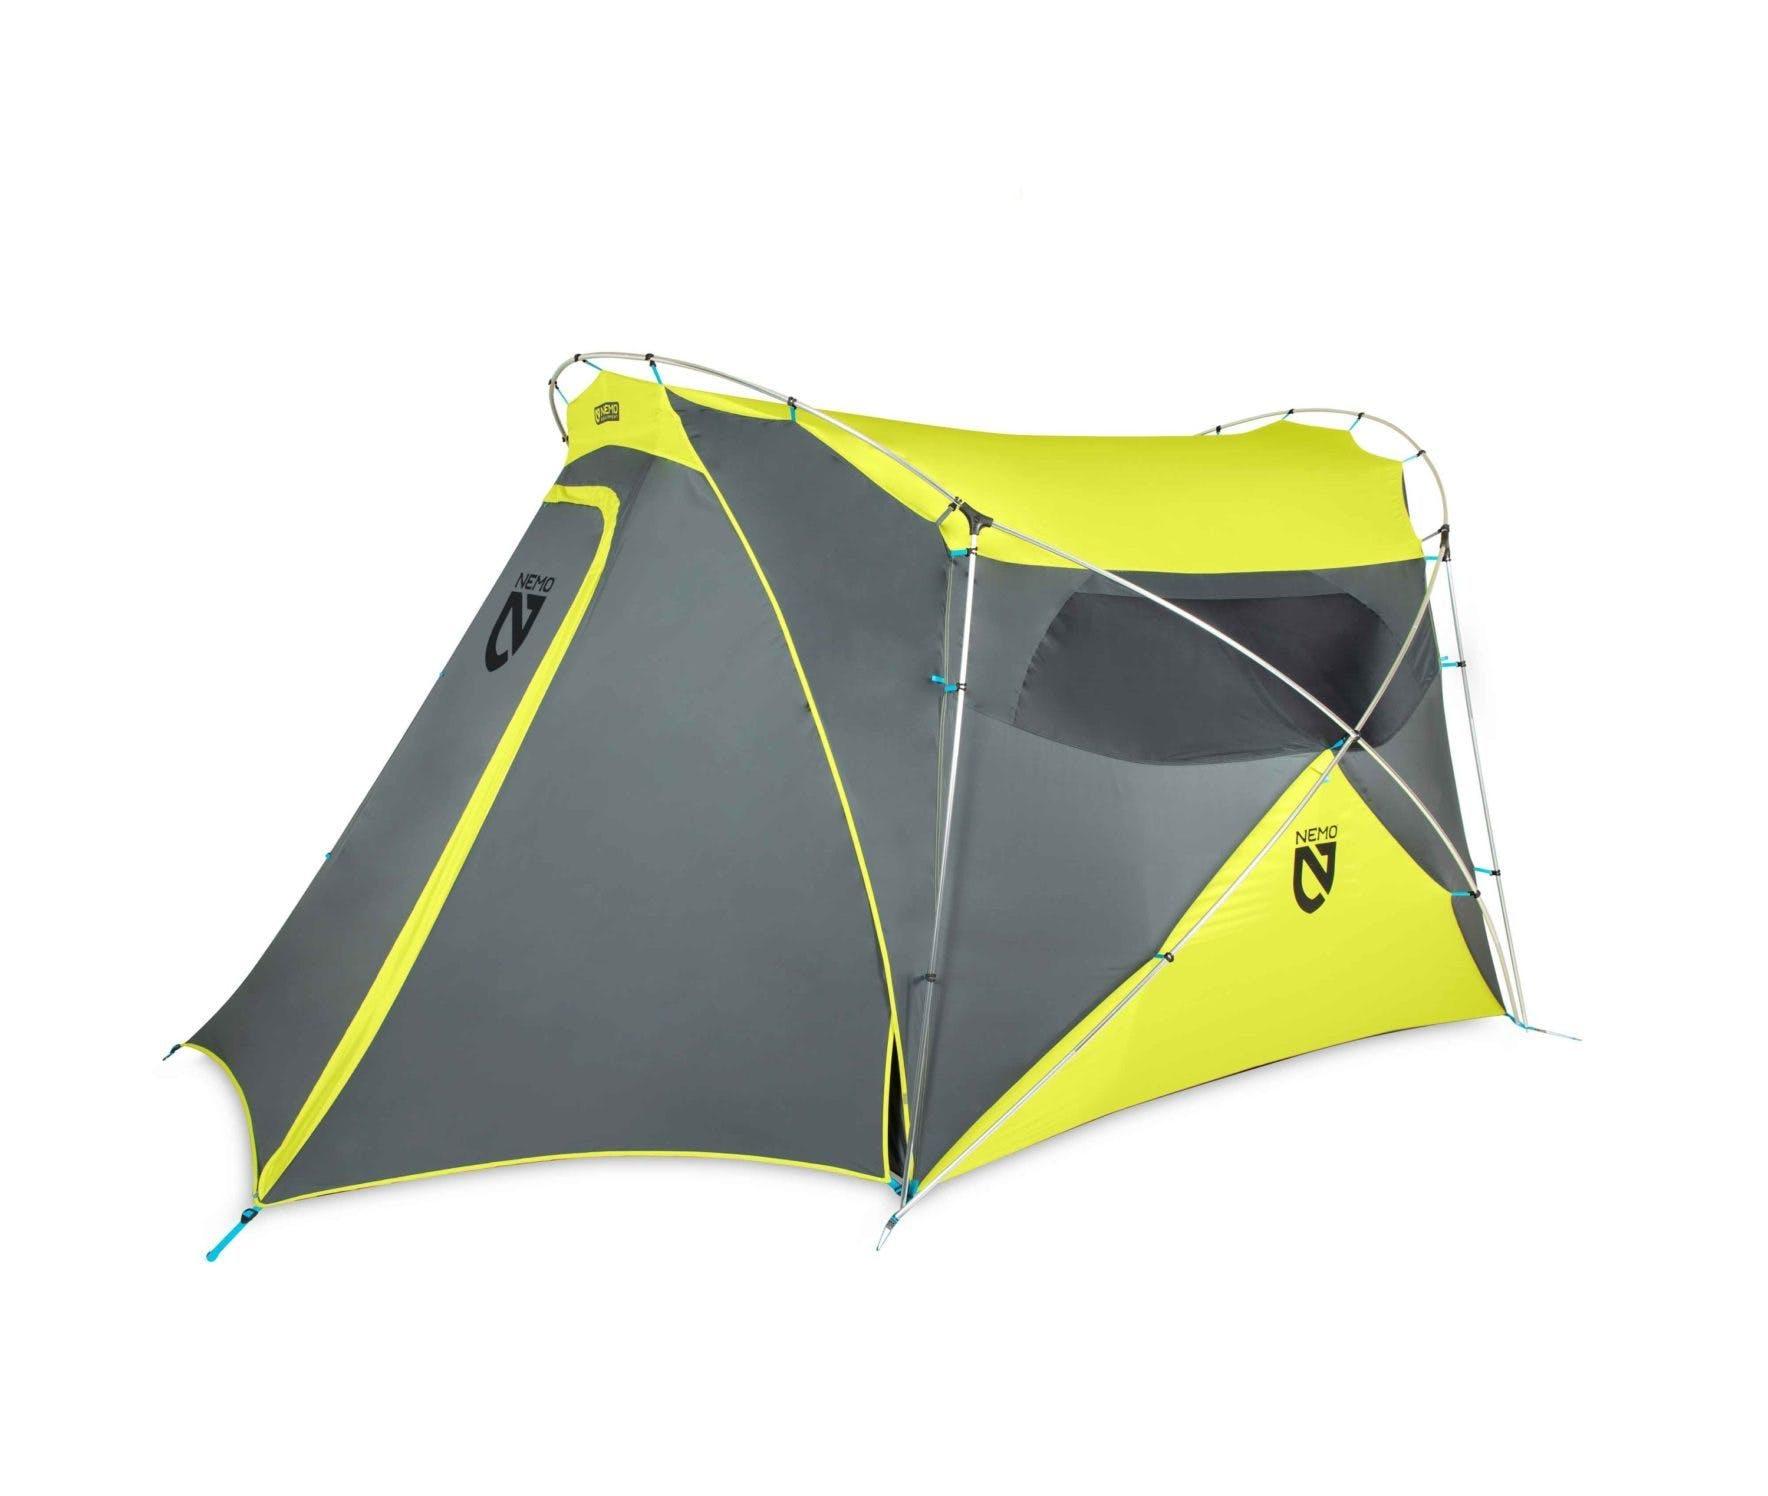 Nemo Wagontop 4P (Goodnight Gray/Lumen) Tent